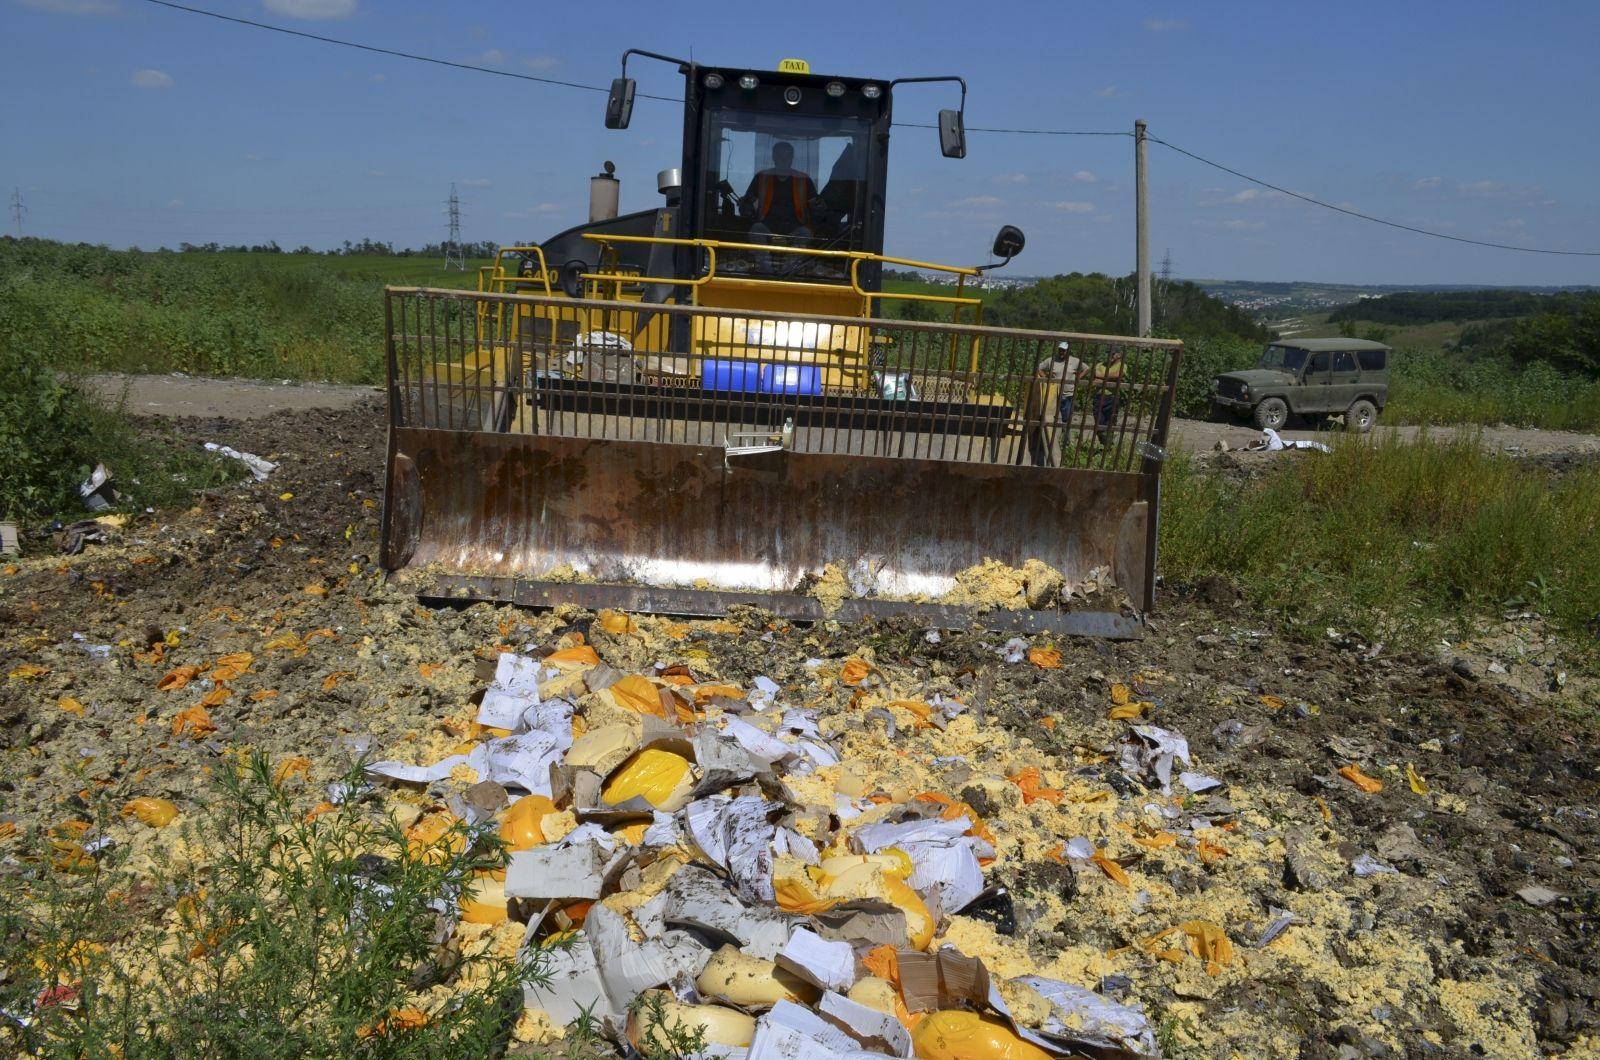 Russia destroys seized food